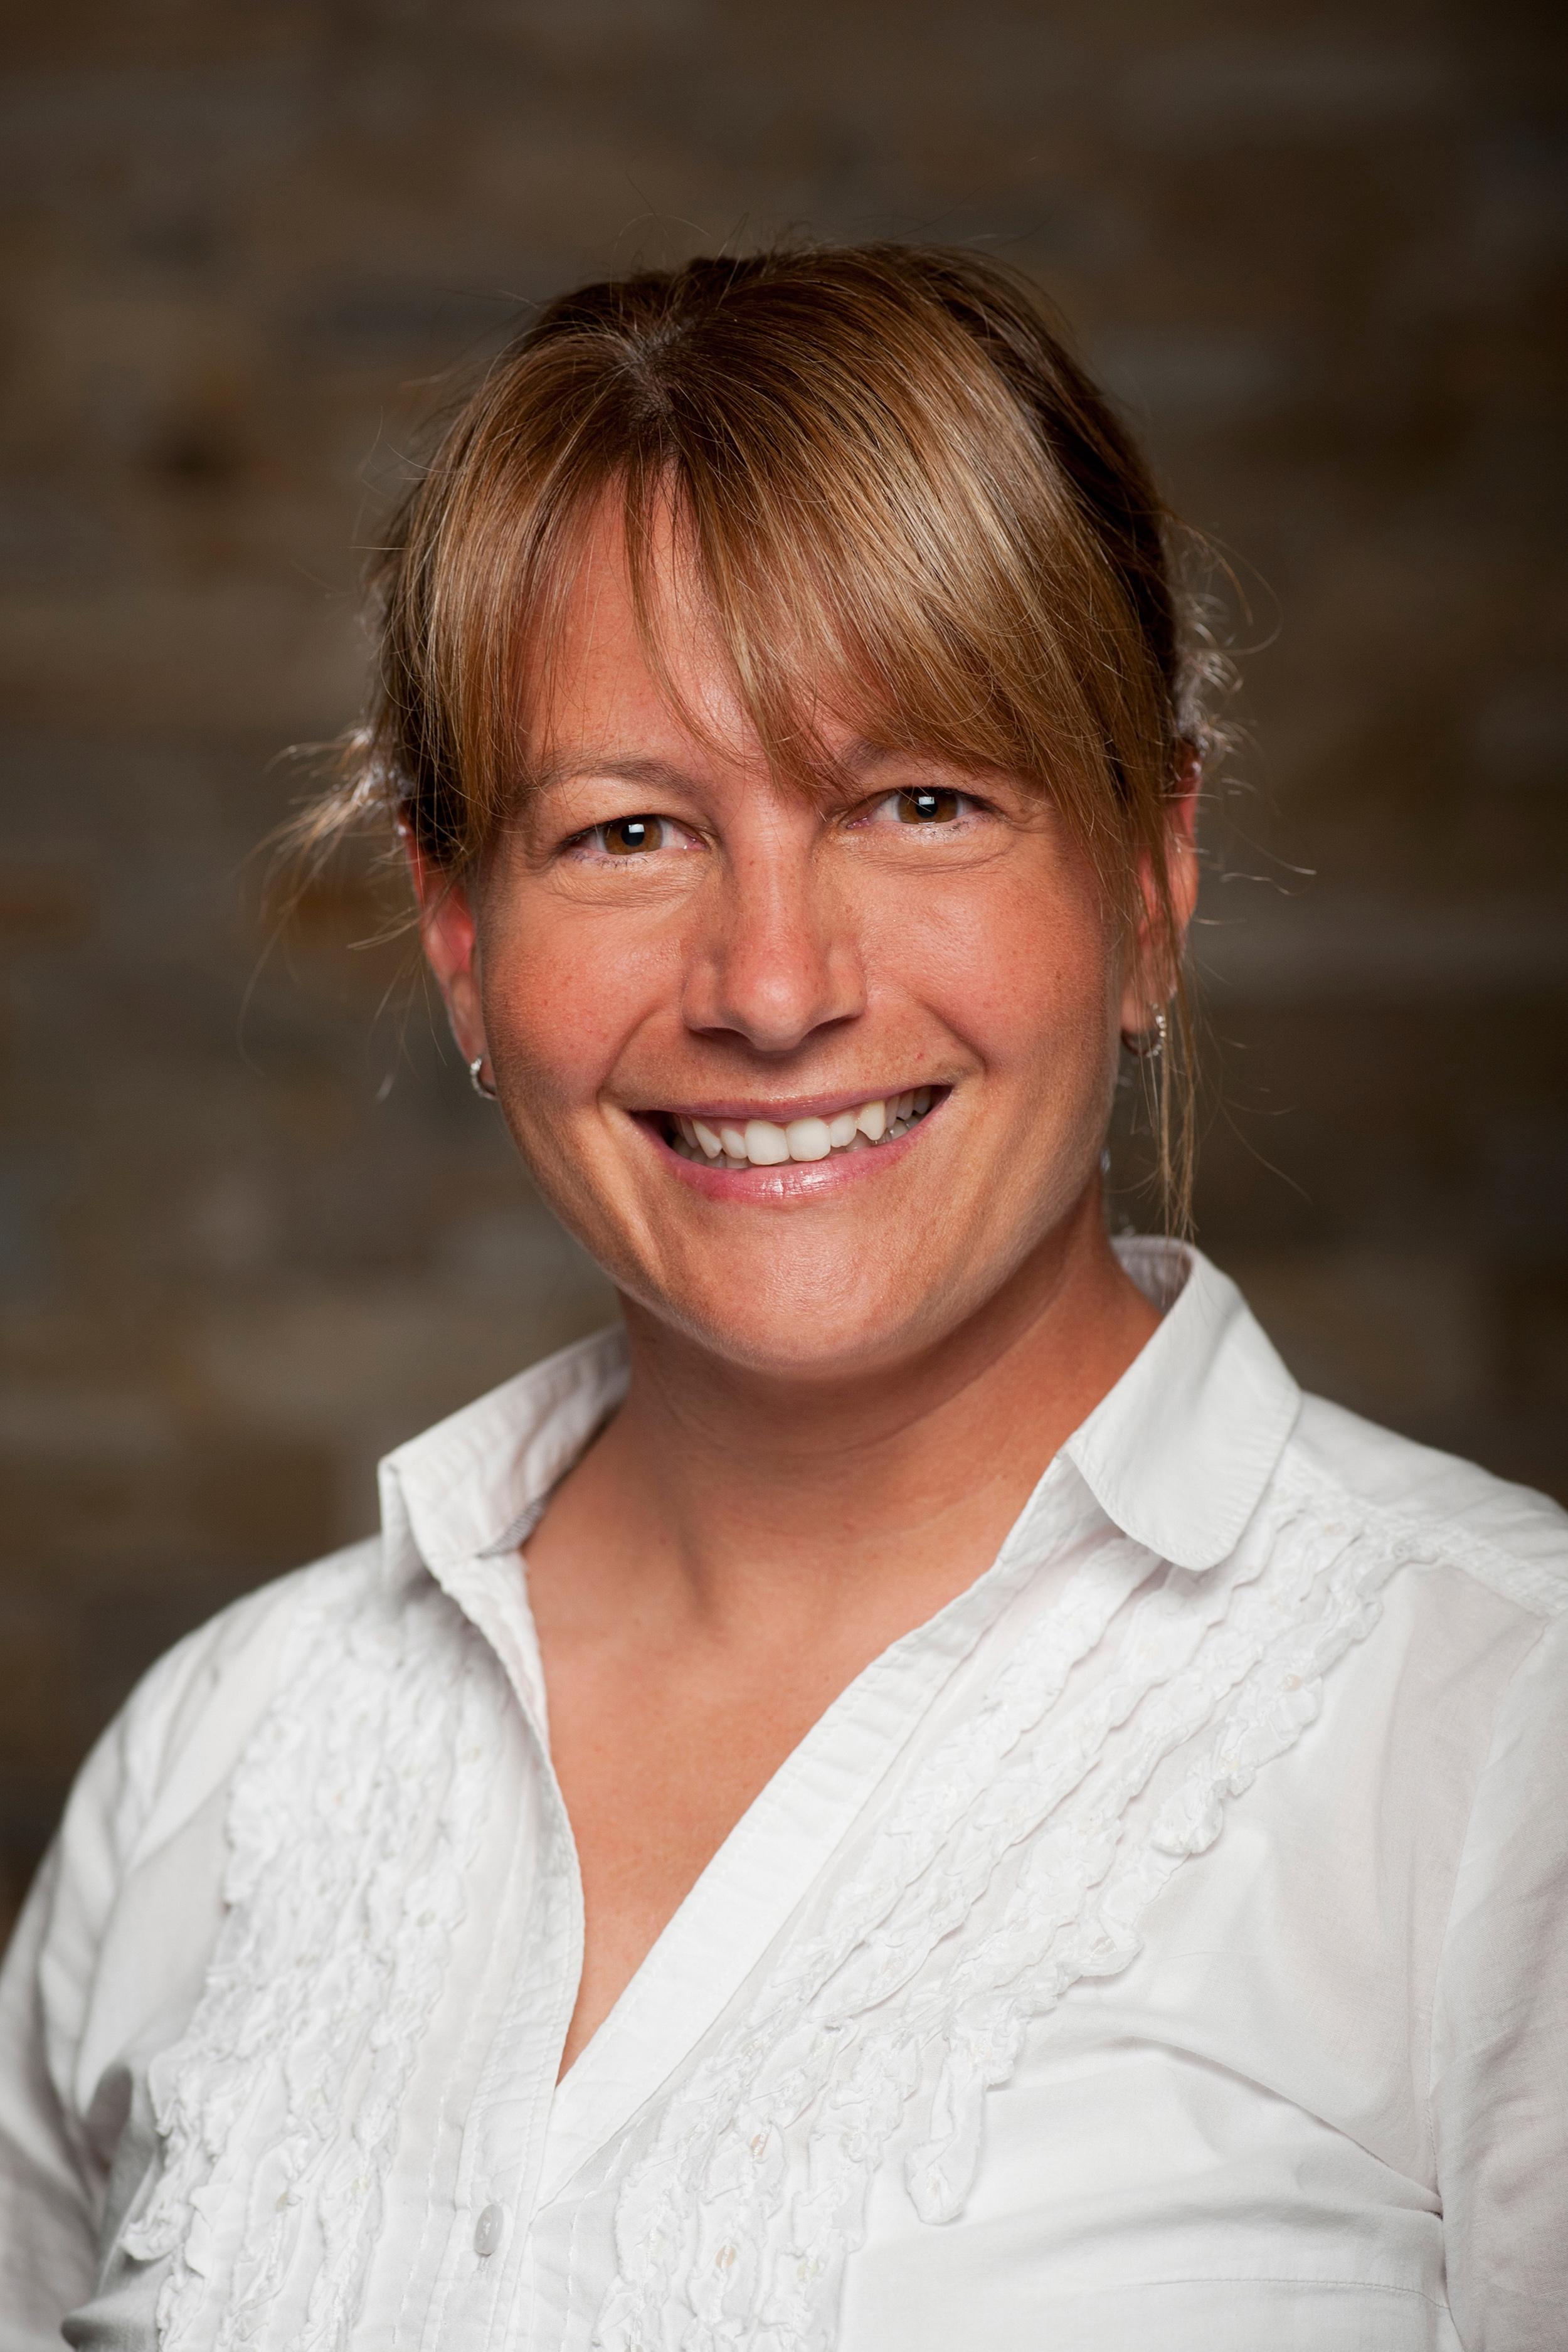 Tracy Vaillancourt